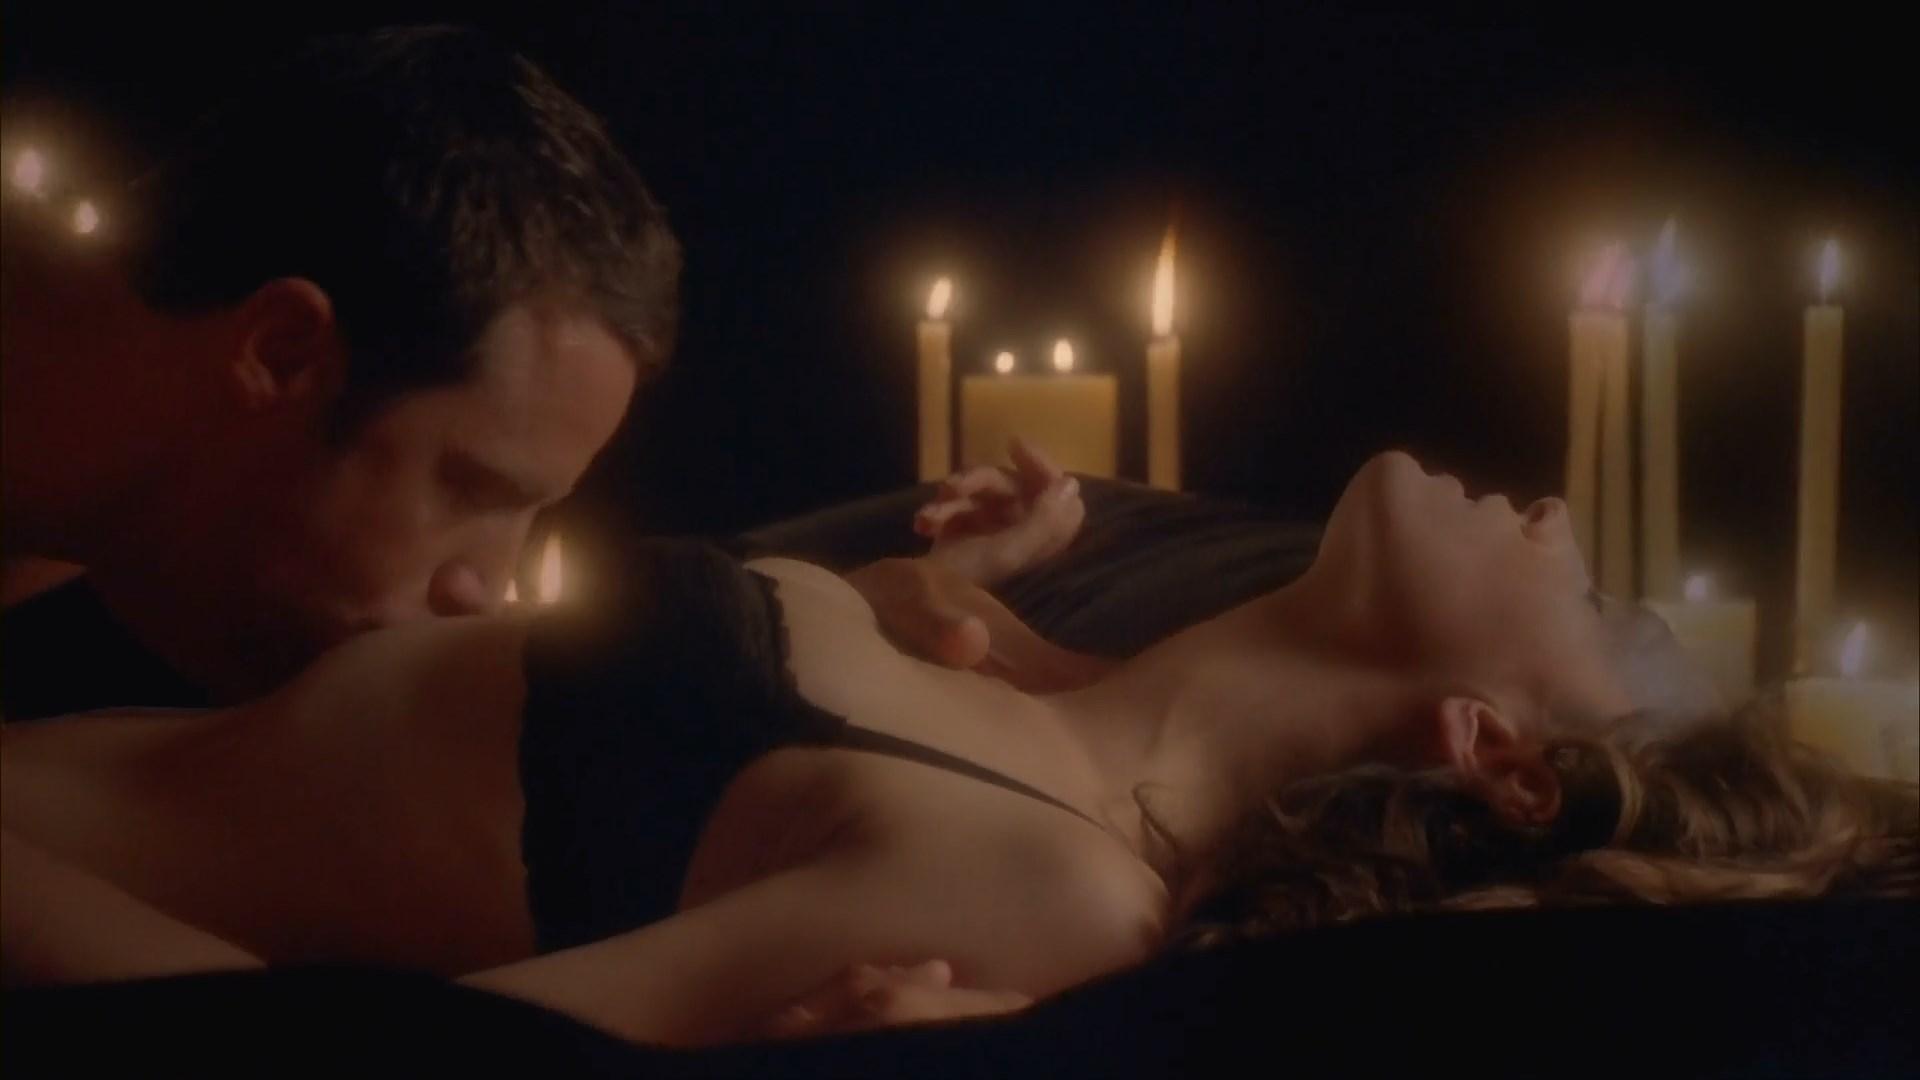 Love sex 2000 nude scenes